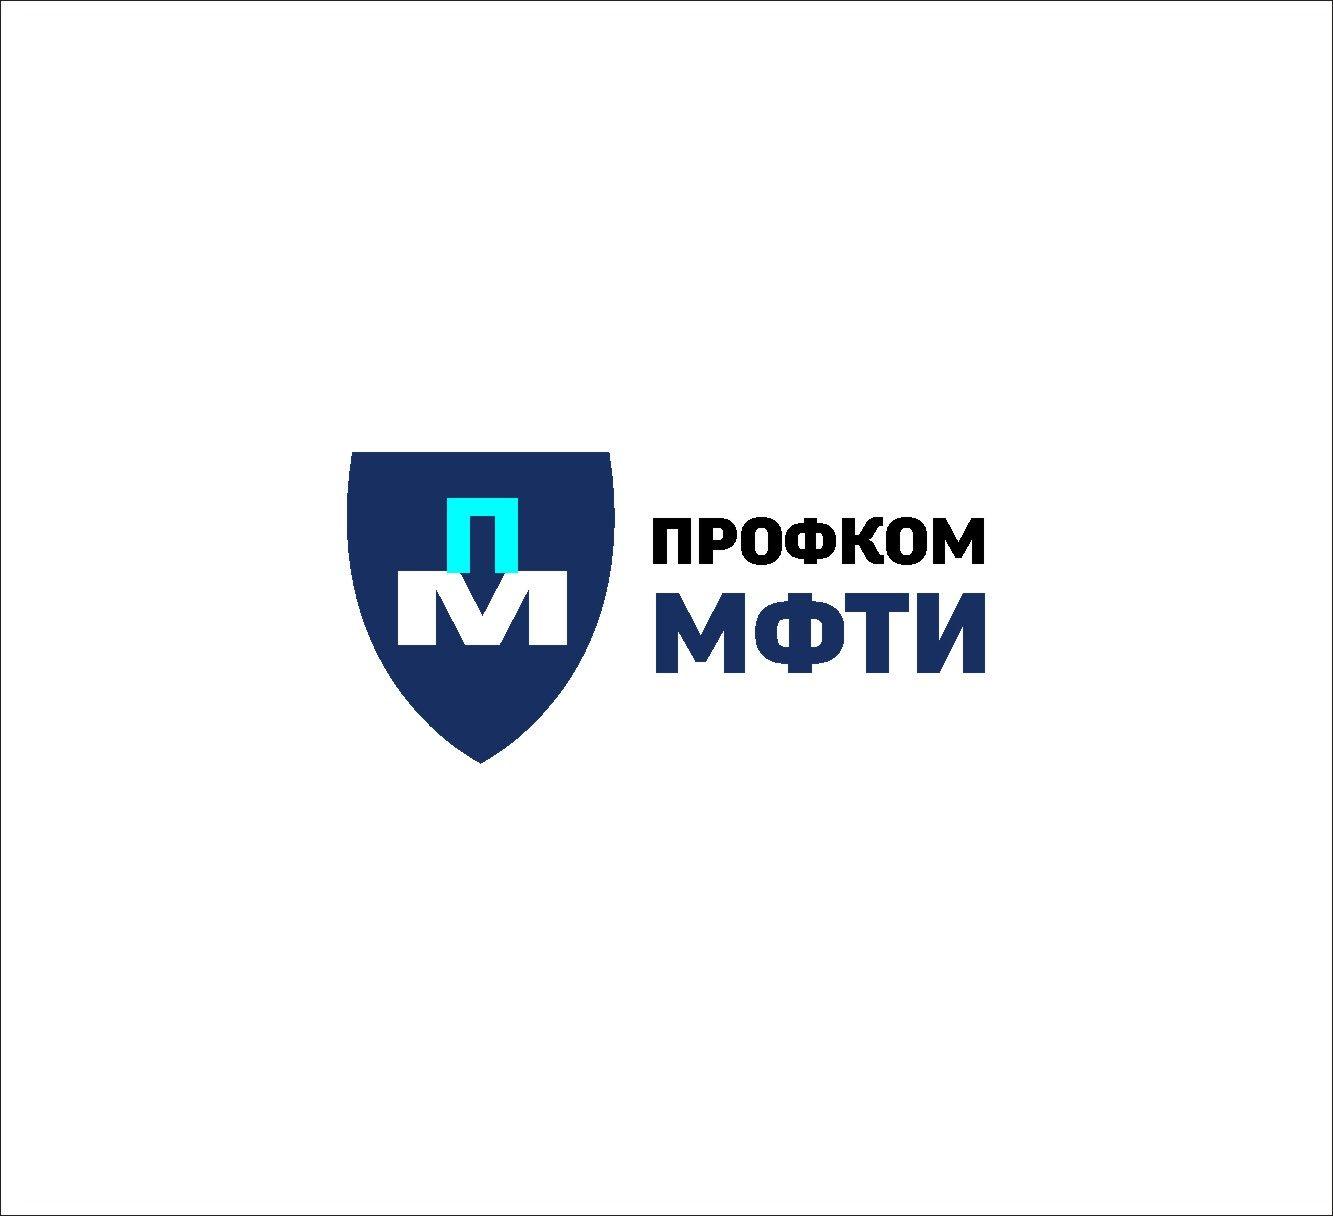 Фирменный стиль для профкома МФТИ - дизайнер radchuk-ruslan